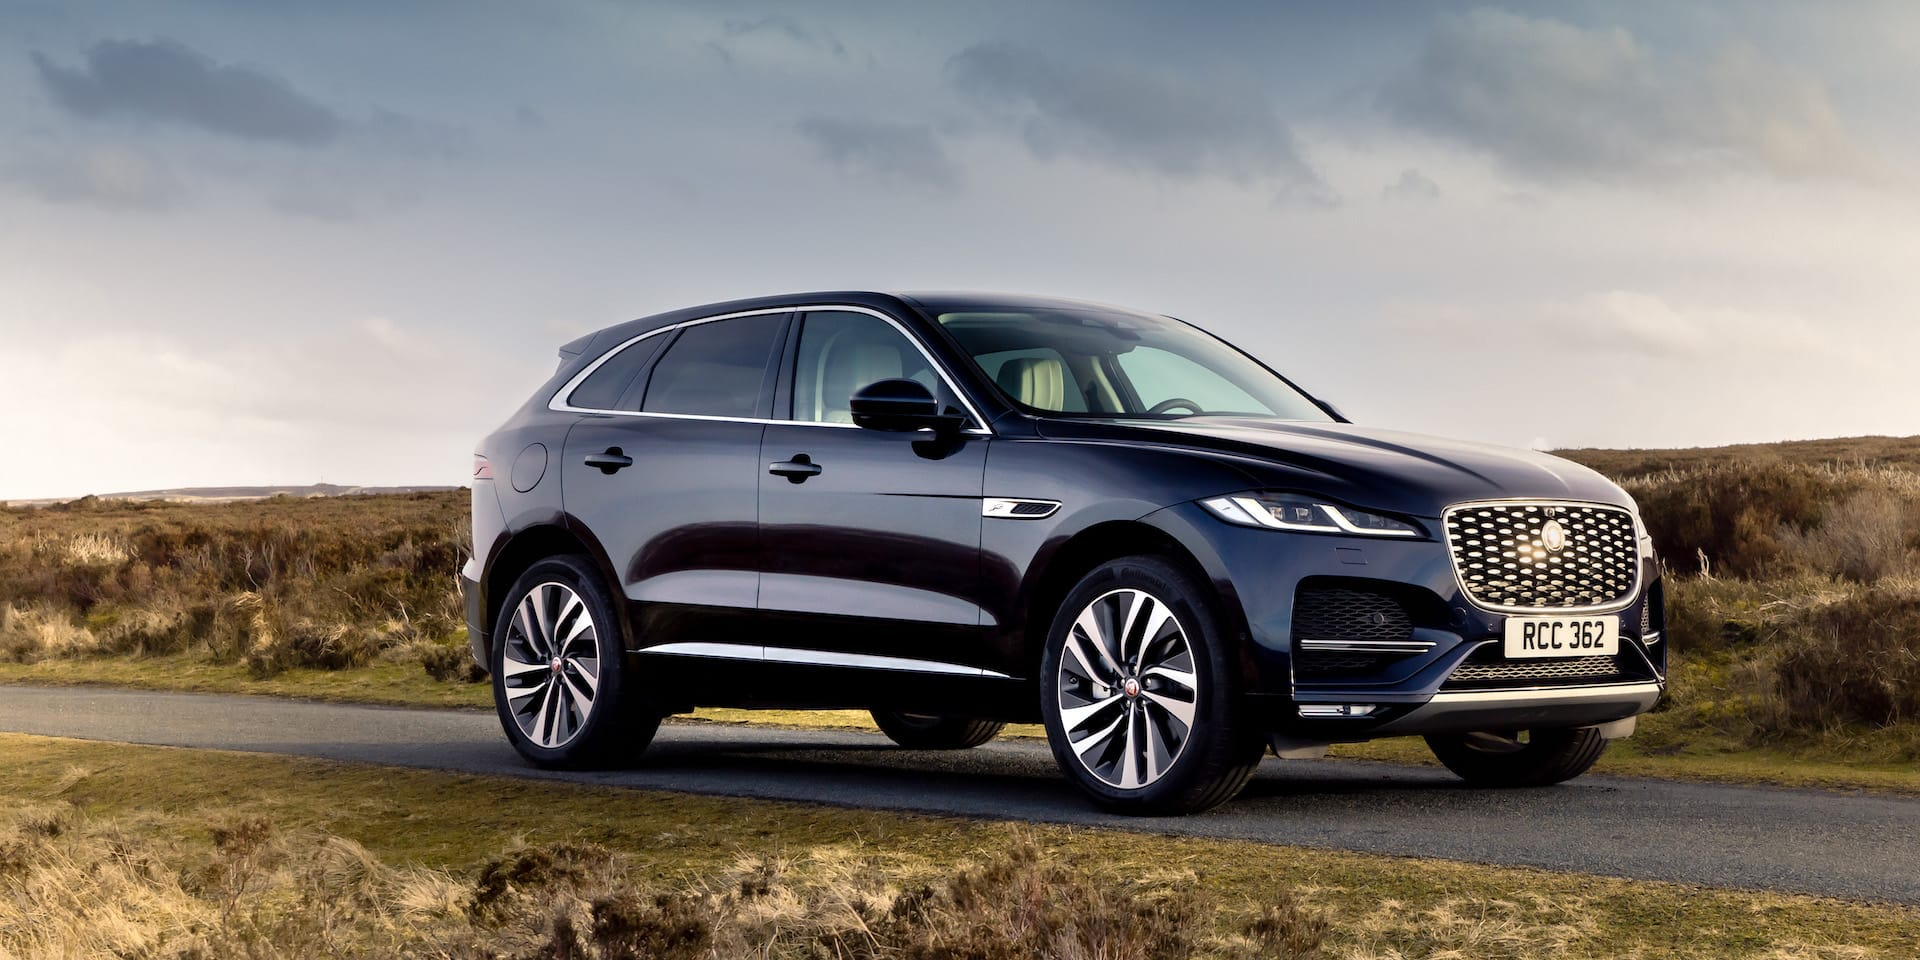 Jaguar F-Pace (2020 facelift) - Expert Rating